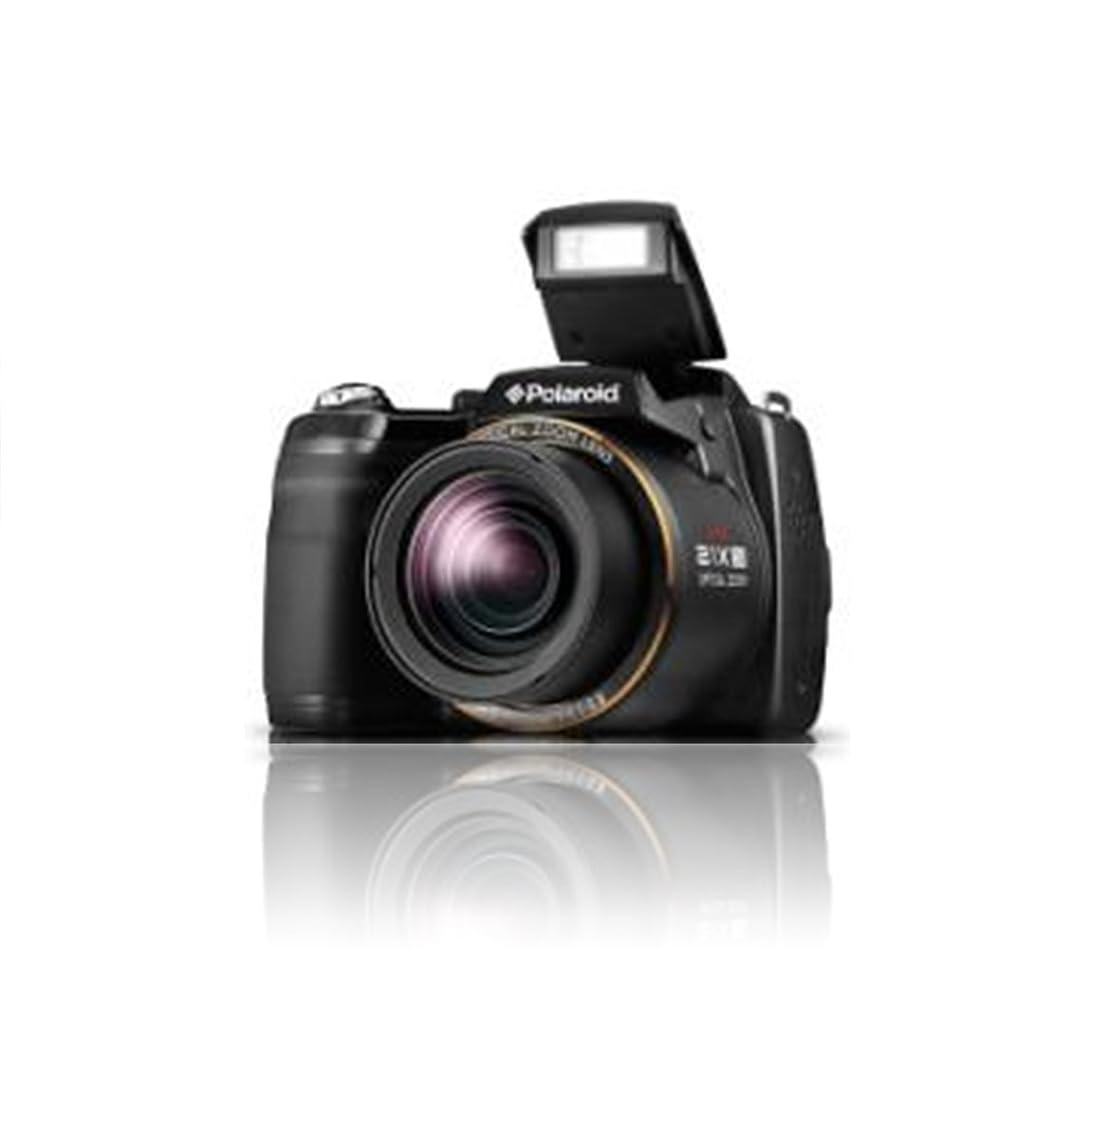 Polaroid IS2132-BLACK 16MP 21X Zoom Digital Still Camera with 2-Inch LCD (Black)